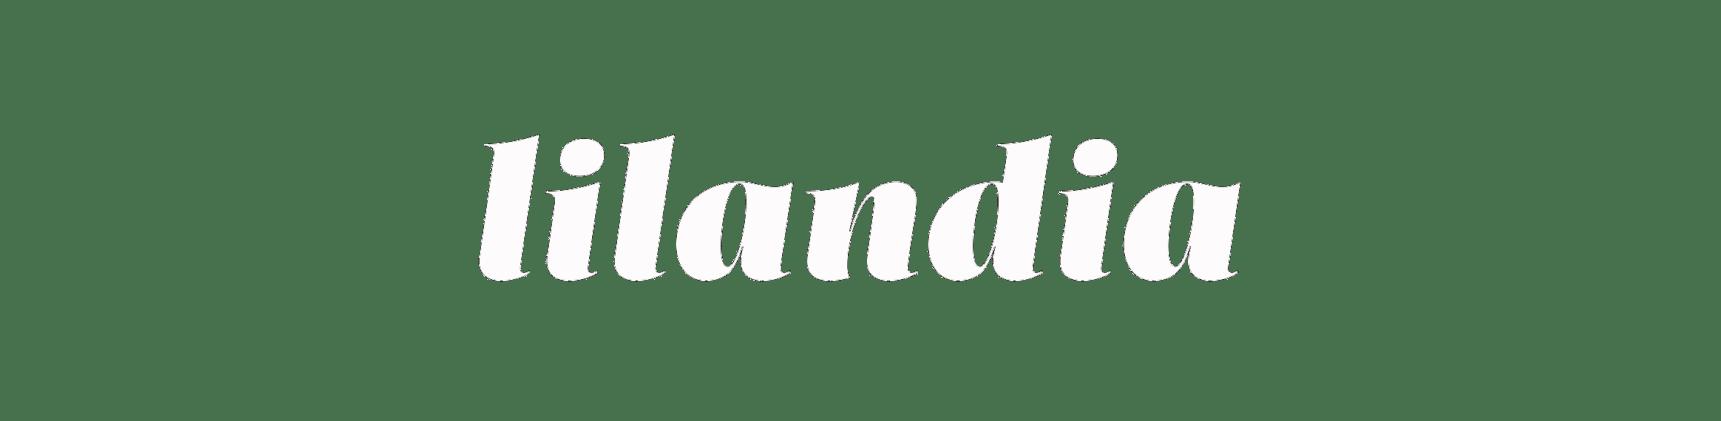 lilandia